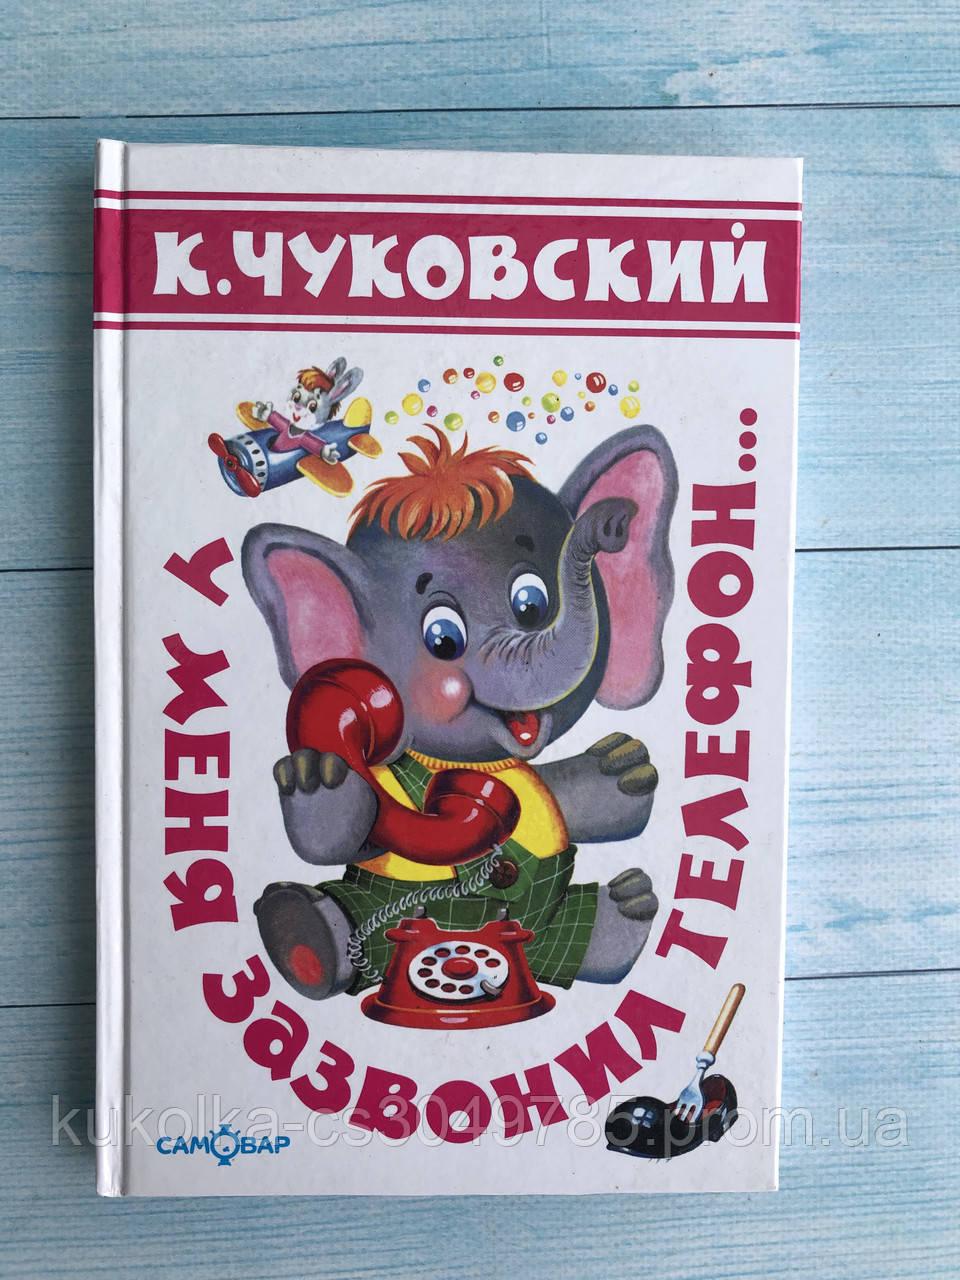 « У меня зазвонил телефон»  Корней Чуковский